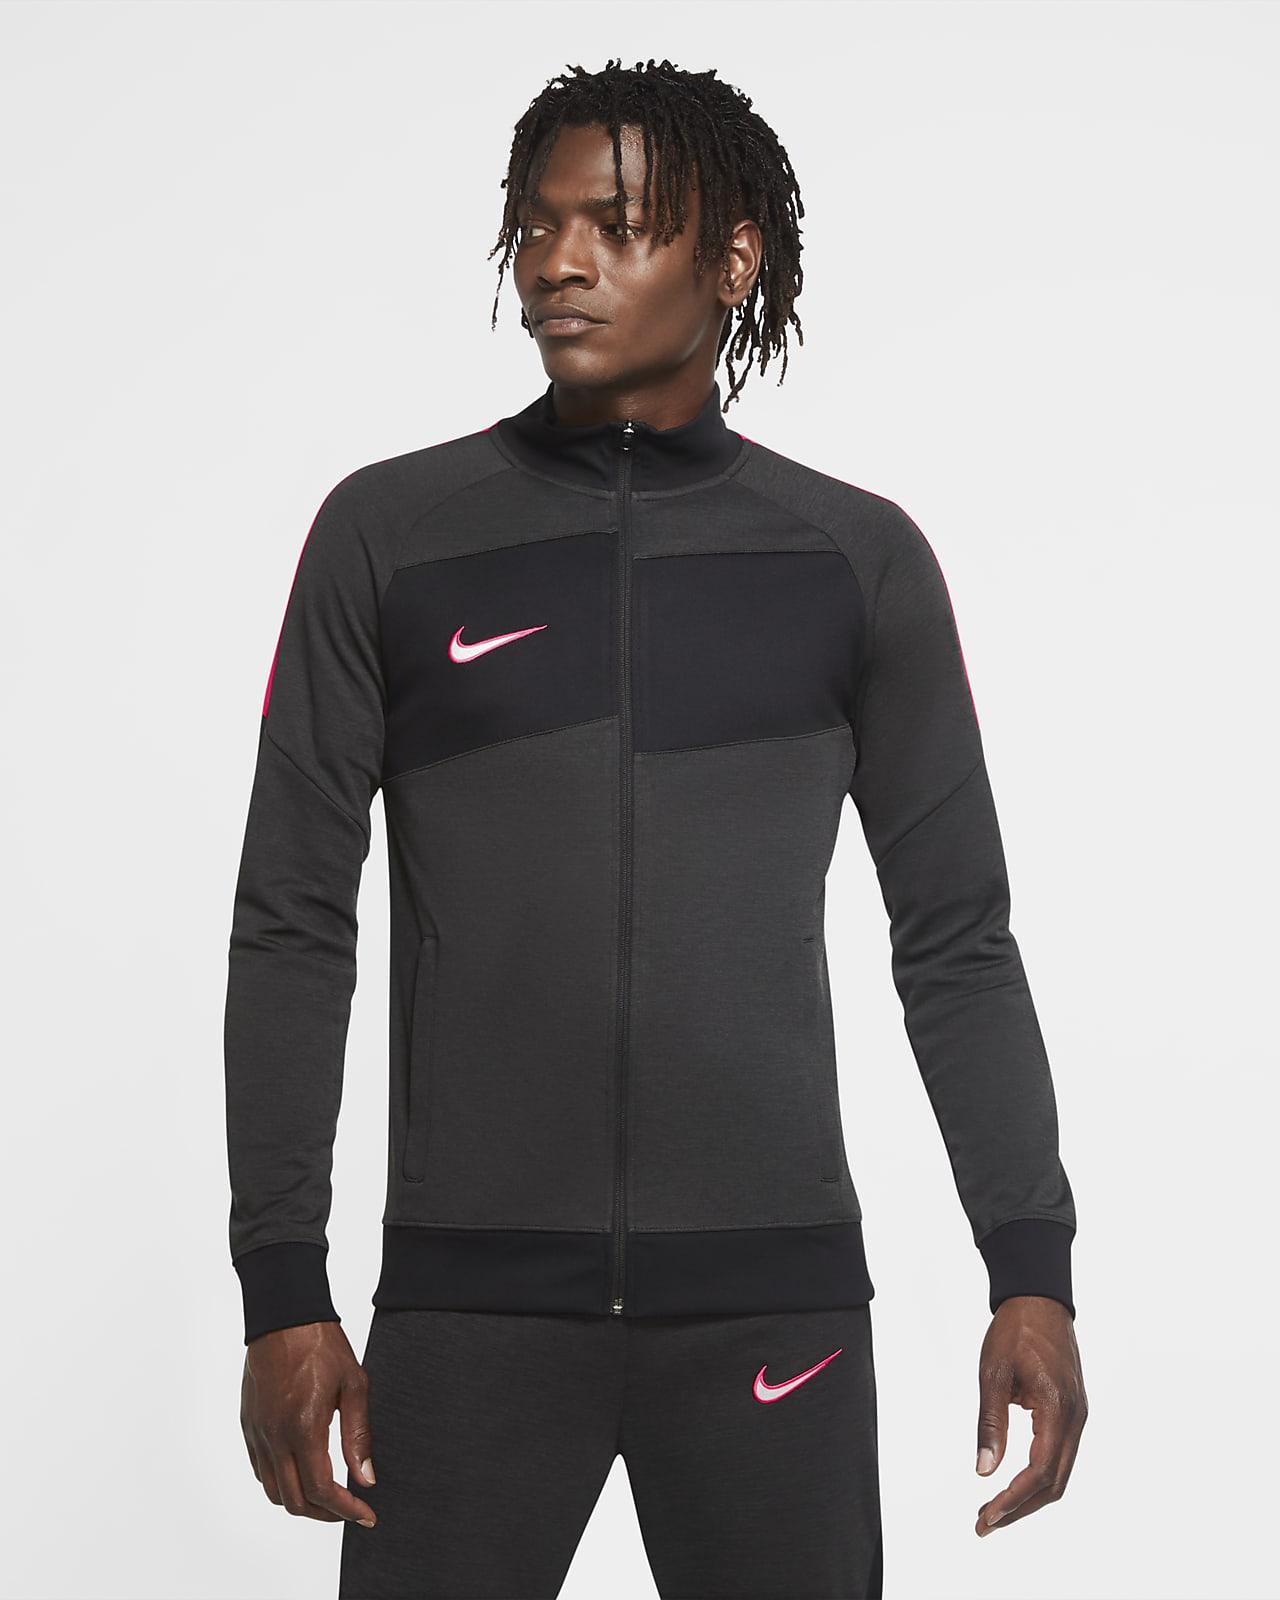 Nike Dri-FIT Academy Men's Knit Football Track Jacket